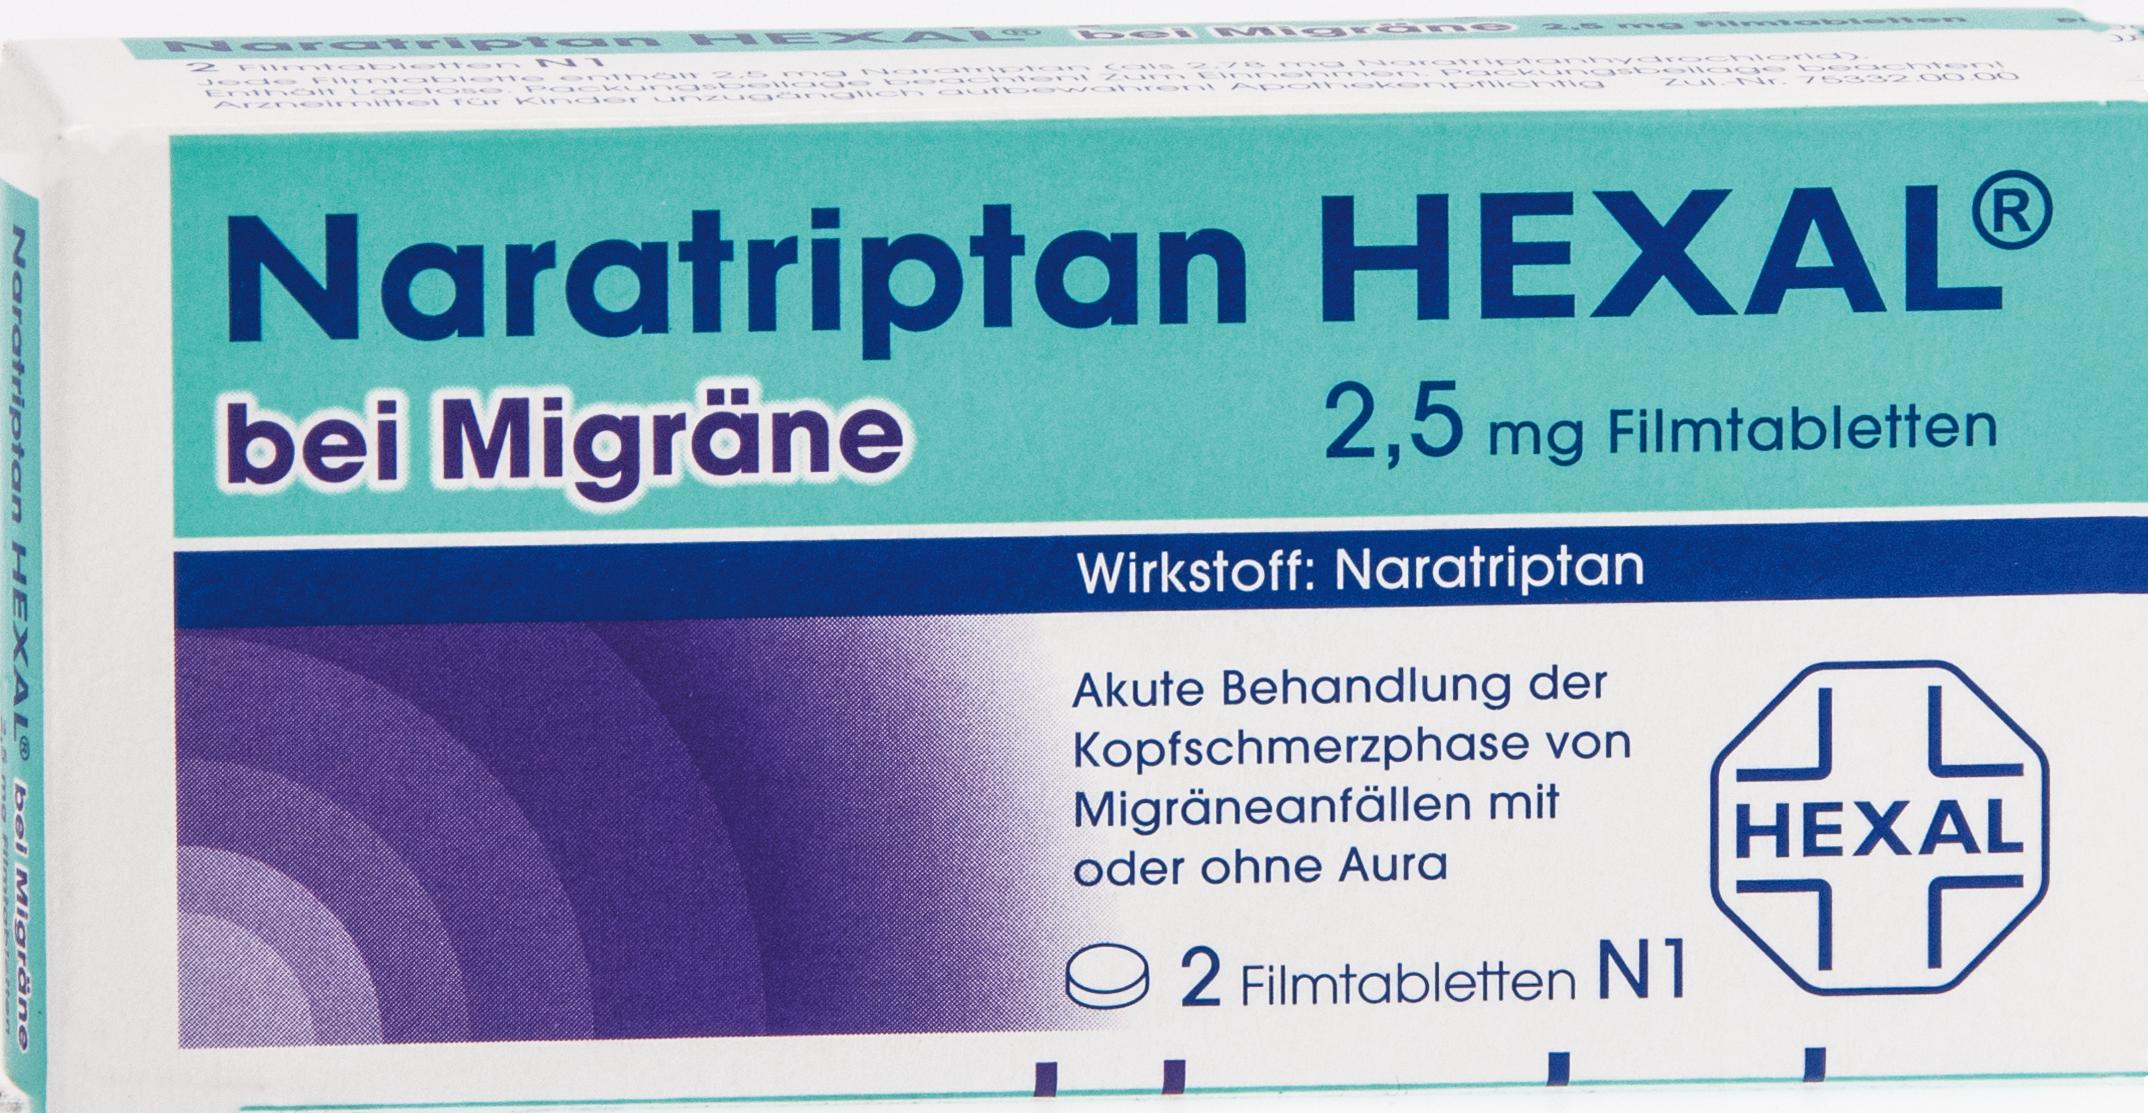 Naratriptan Hexal bei Migräne 2.5mg